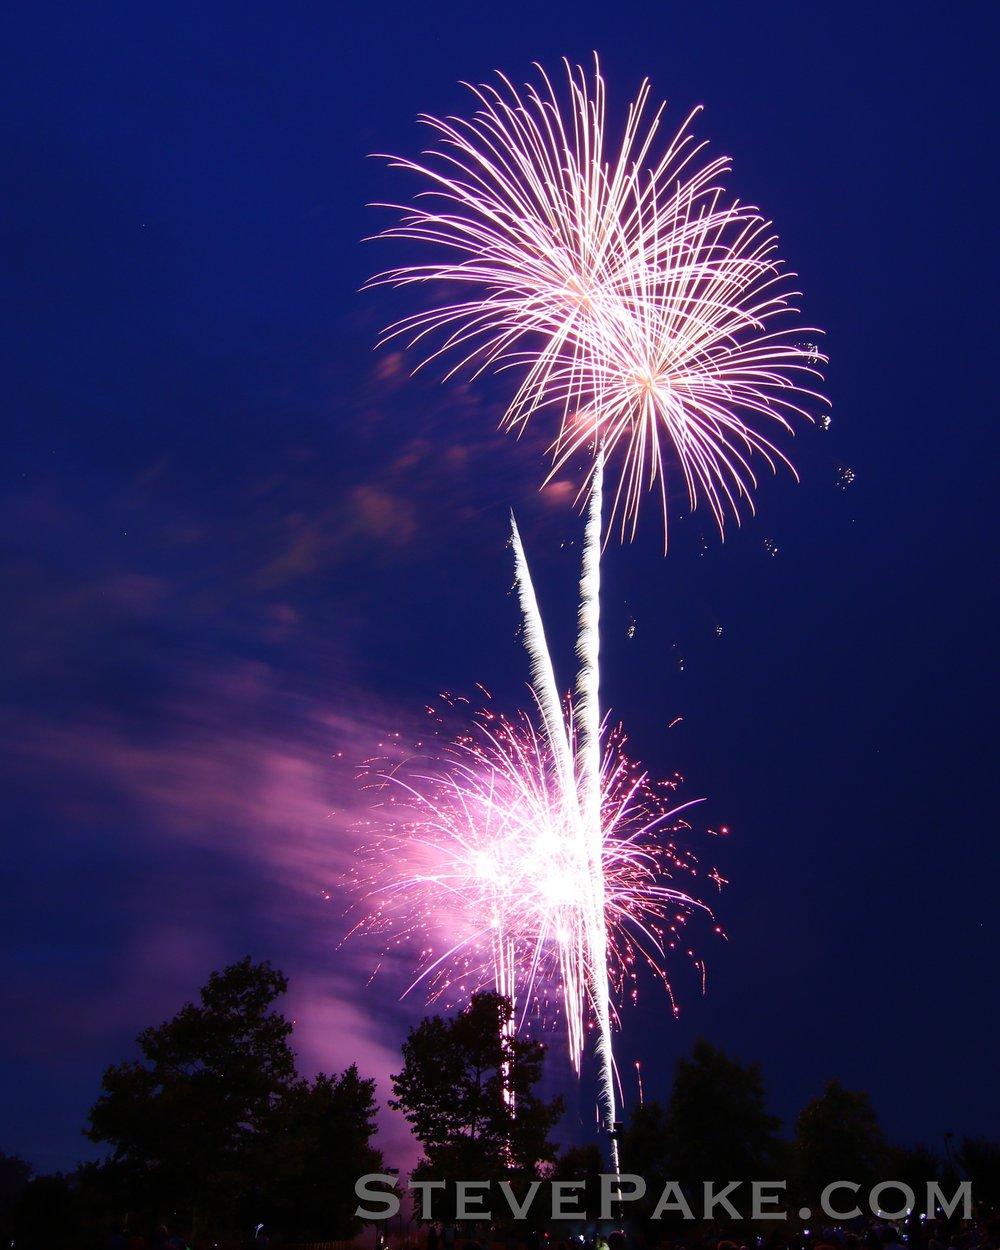 Fireworks2018_09_GE3A8507ap-HD-WM.jpg